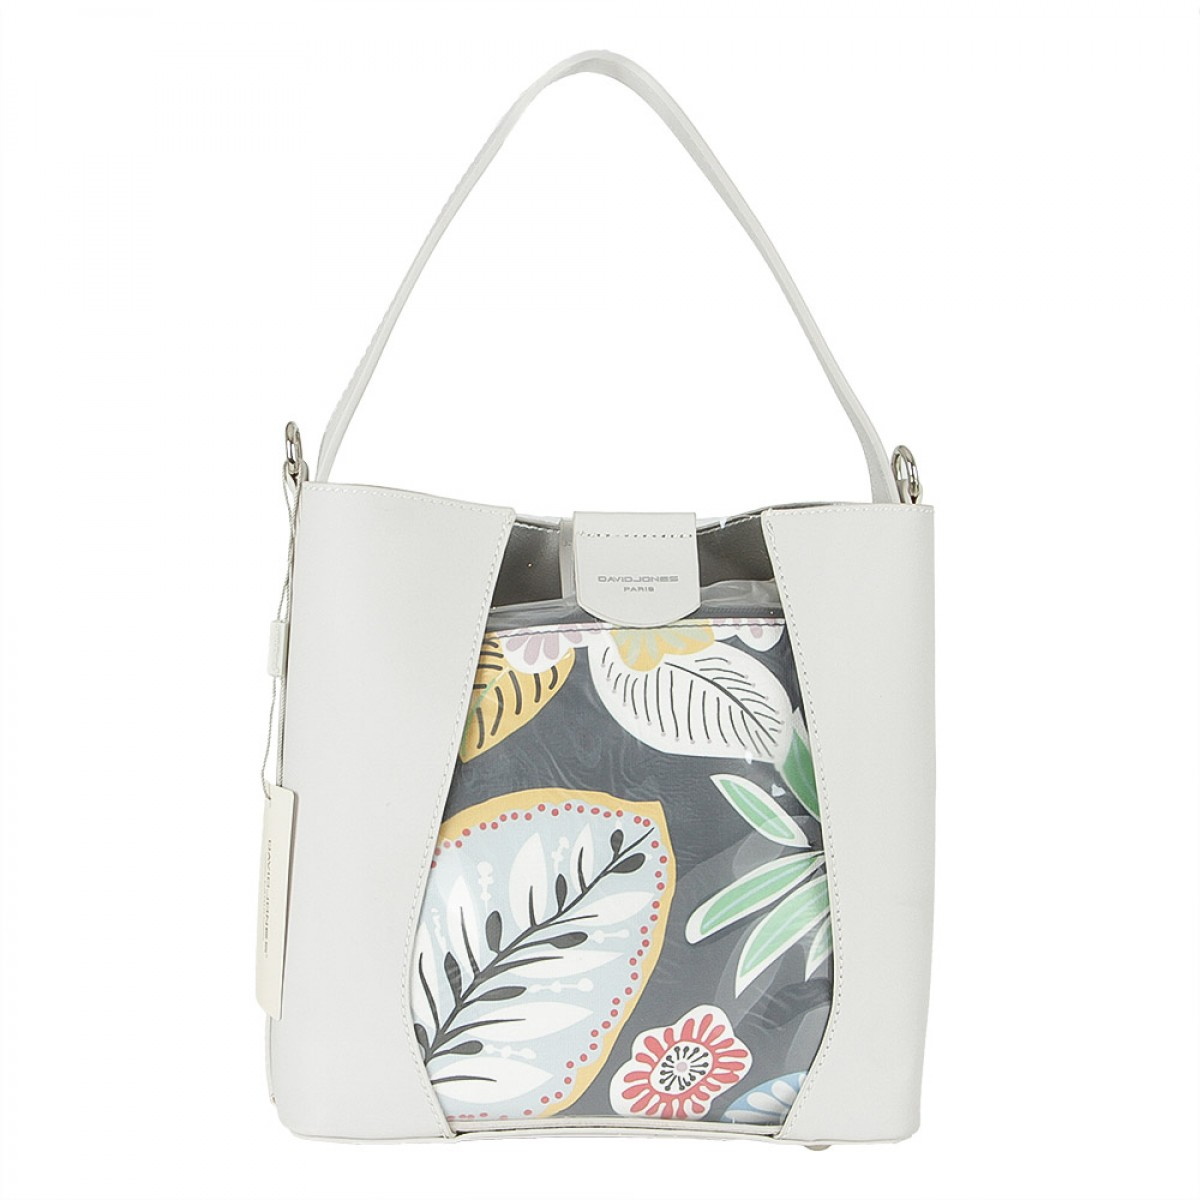 Жіноча сумка David Jones 6245-1 CREAMY WHITE